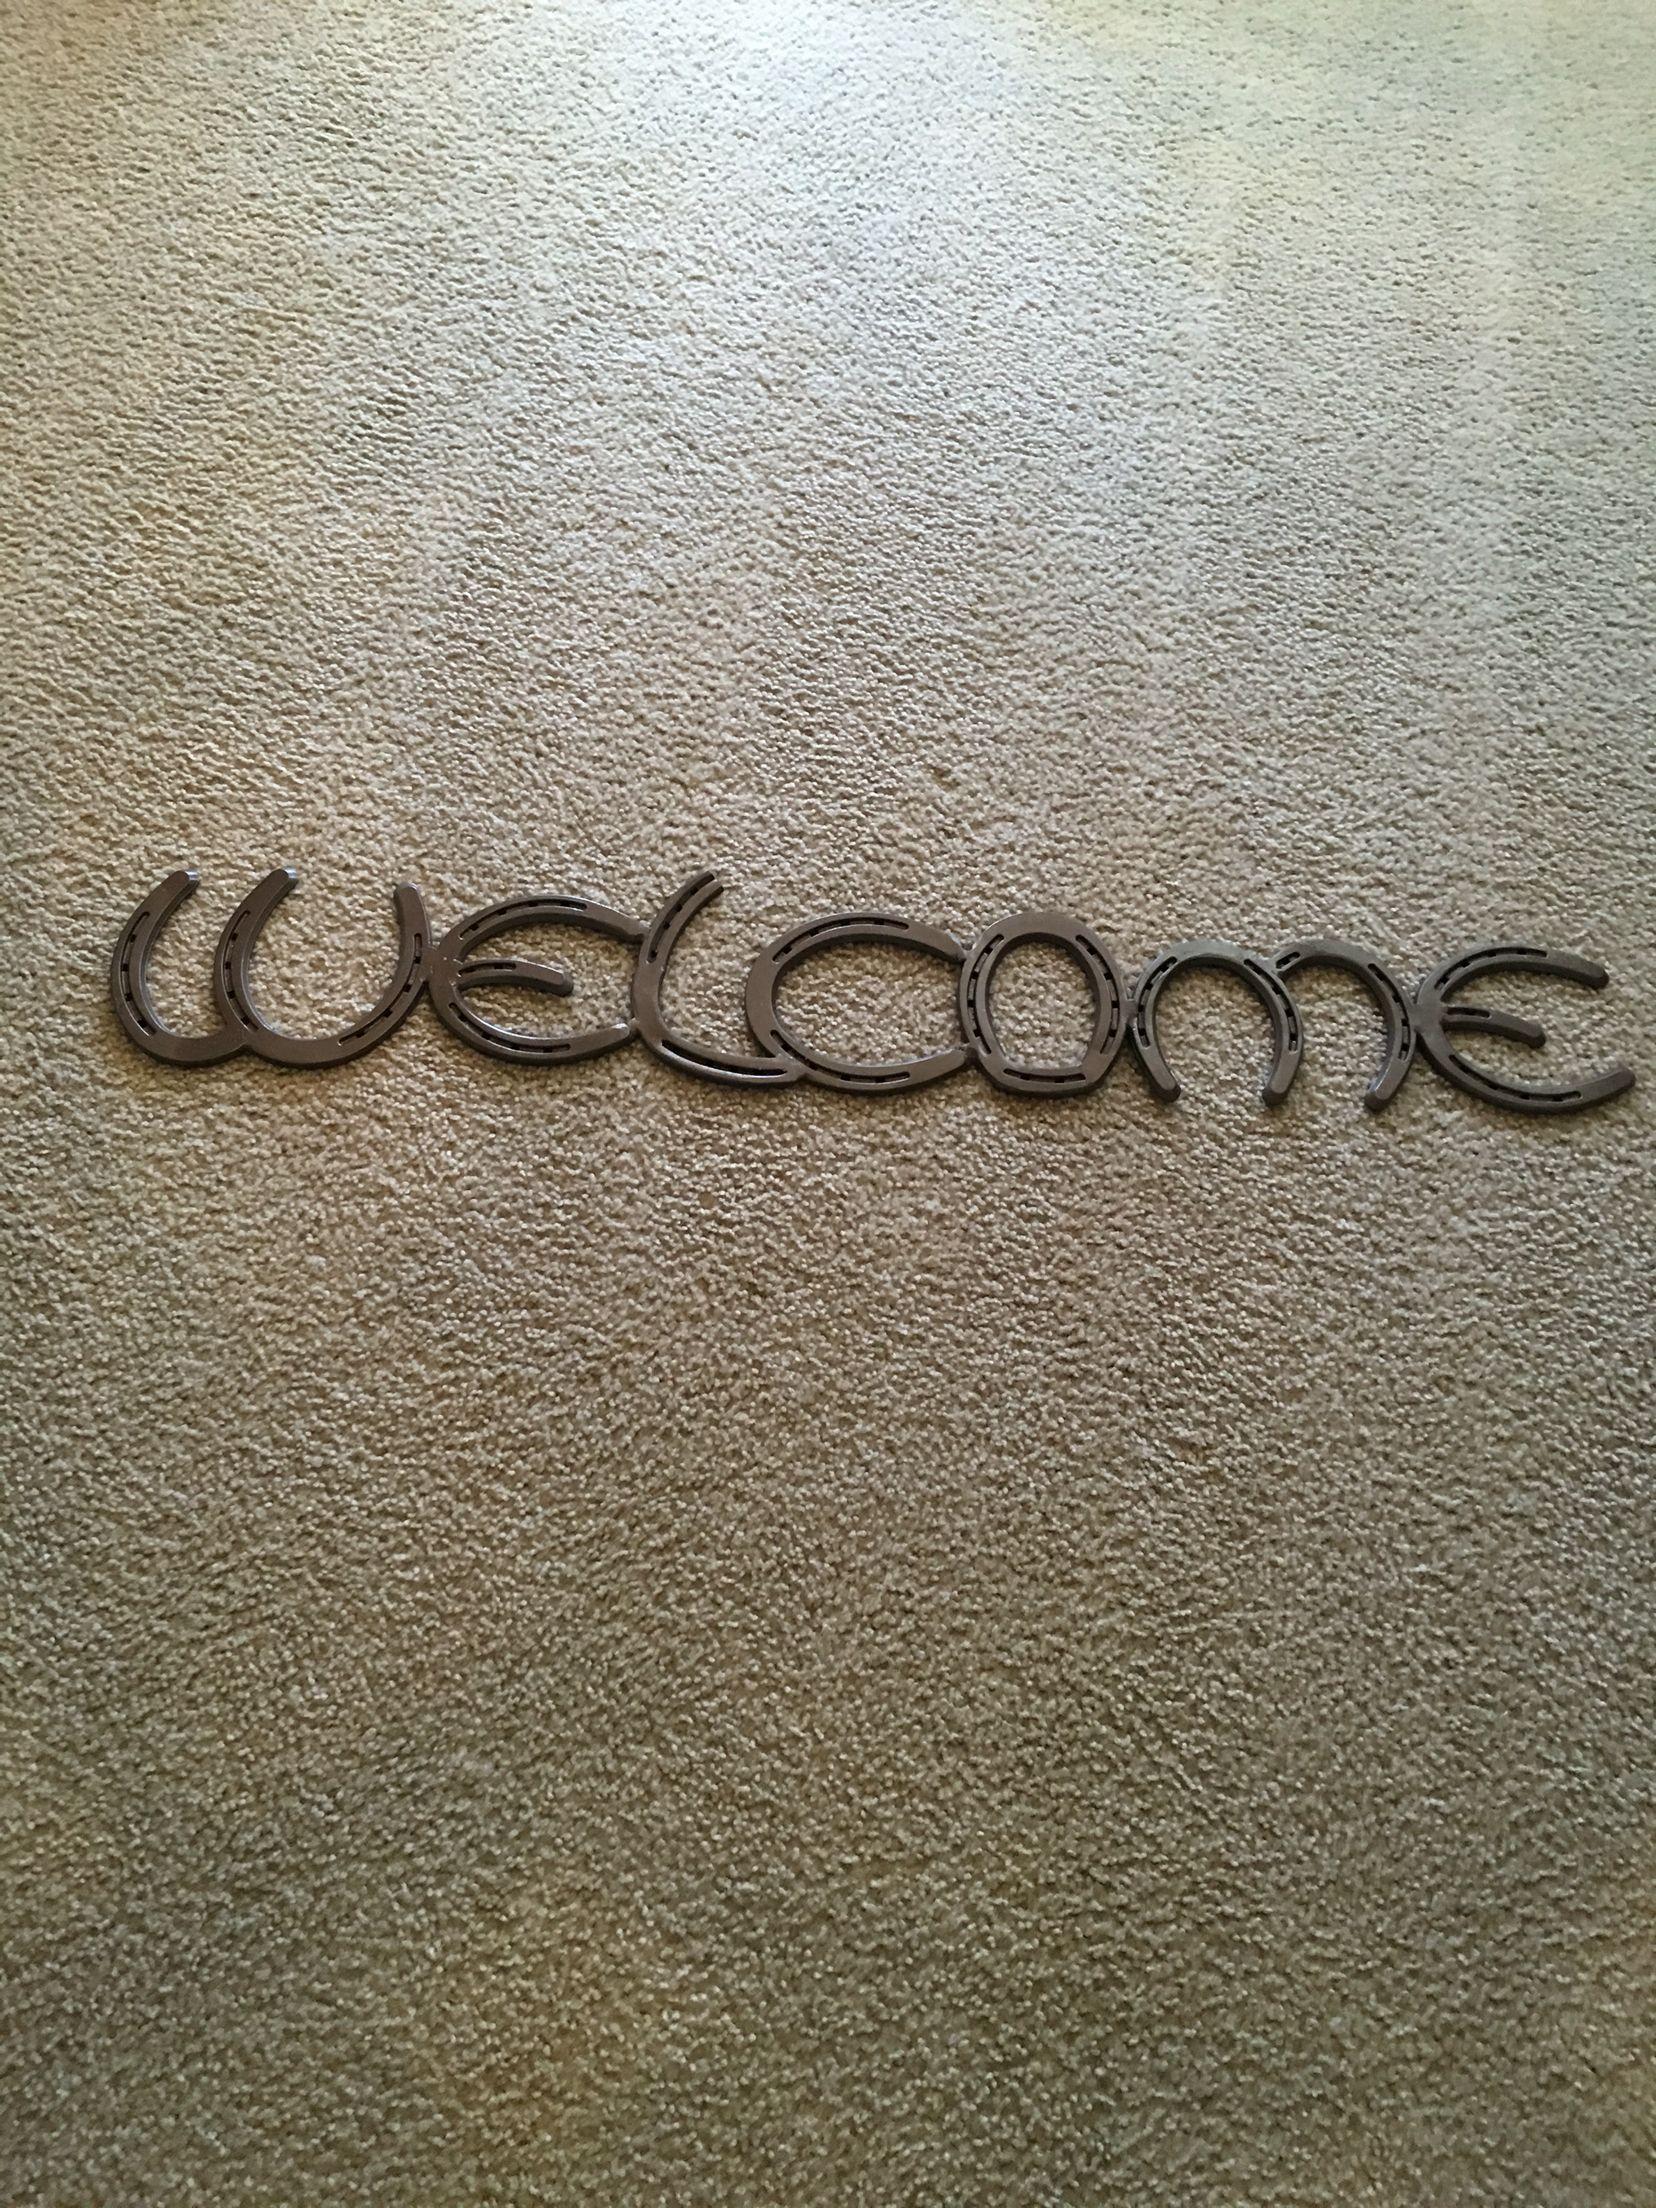 Custom horseshoe welcome sign DMRUSTIC.com